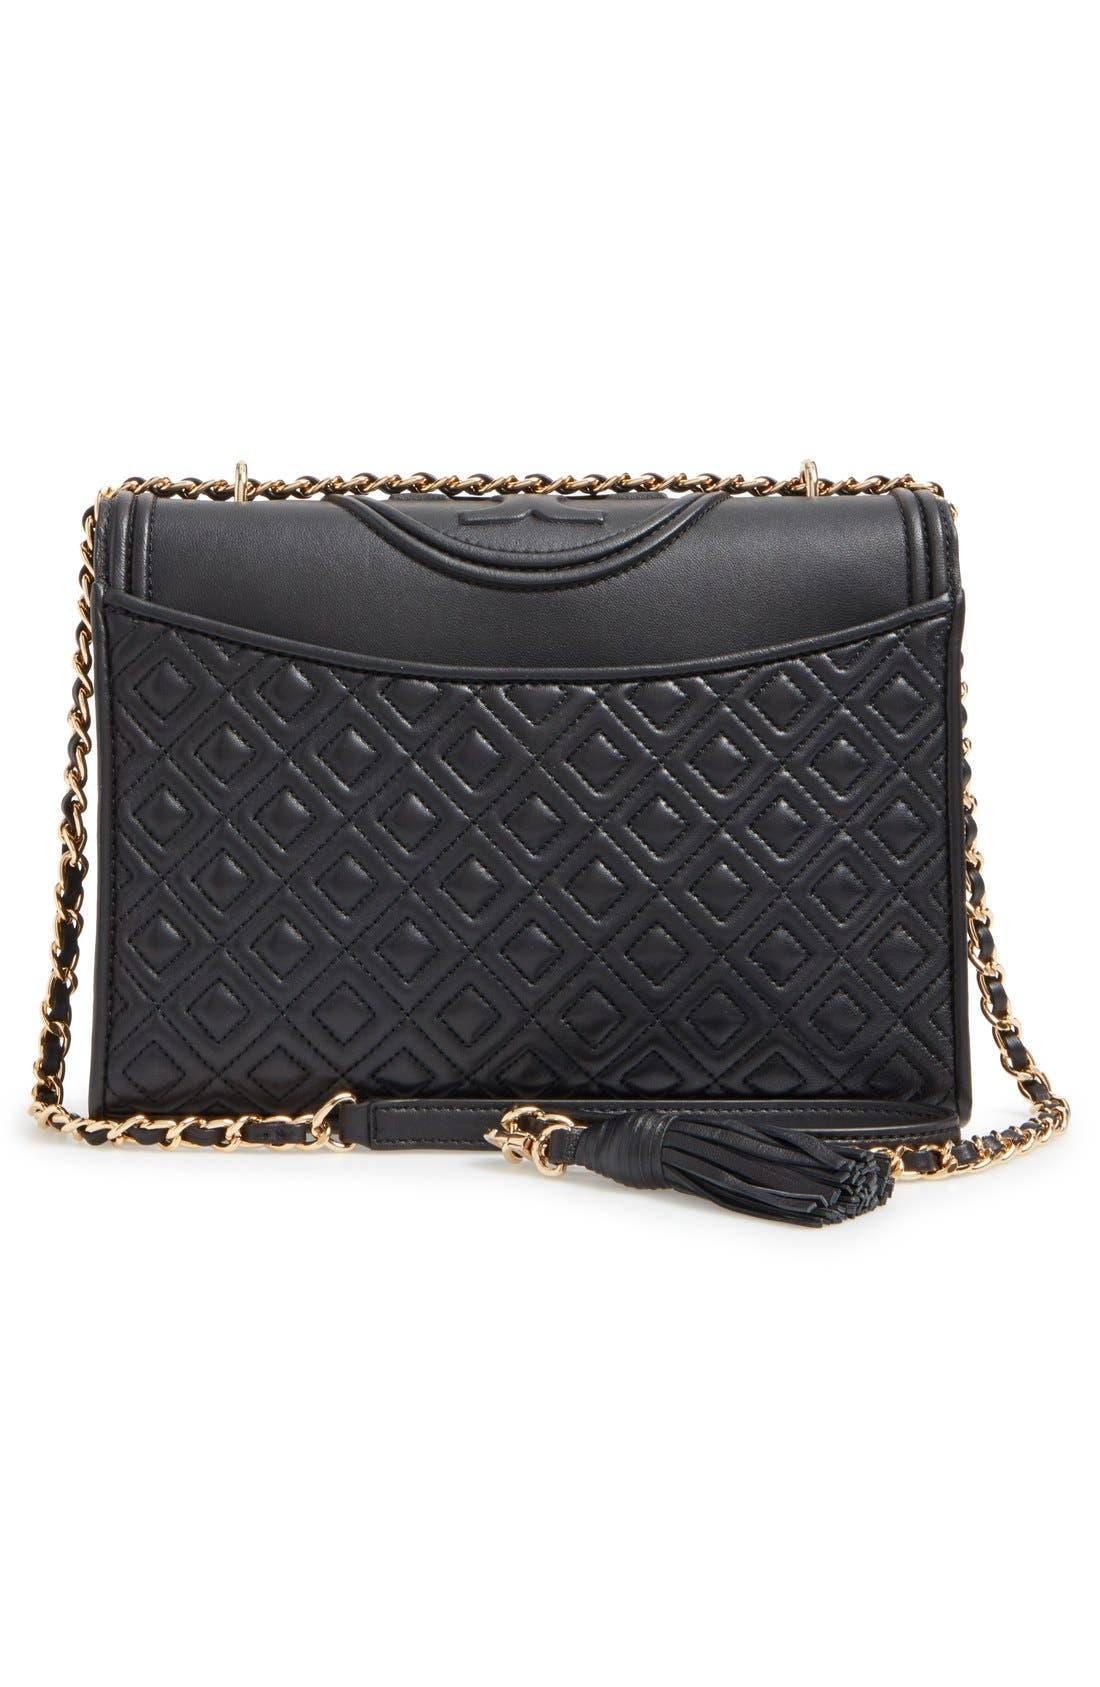 'Fleming' Convertible Shoulder Bag,                             Alternate thumbnail 3, color,                             BLACK